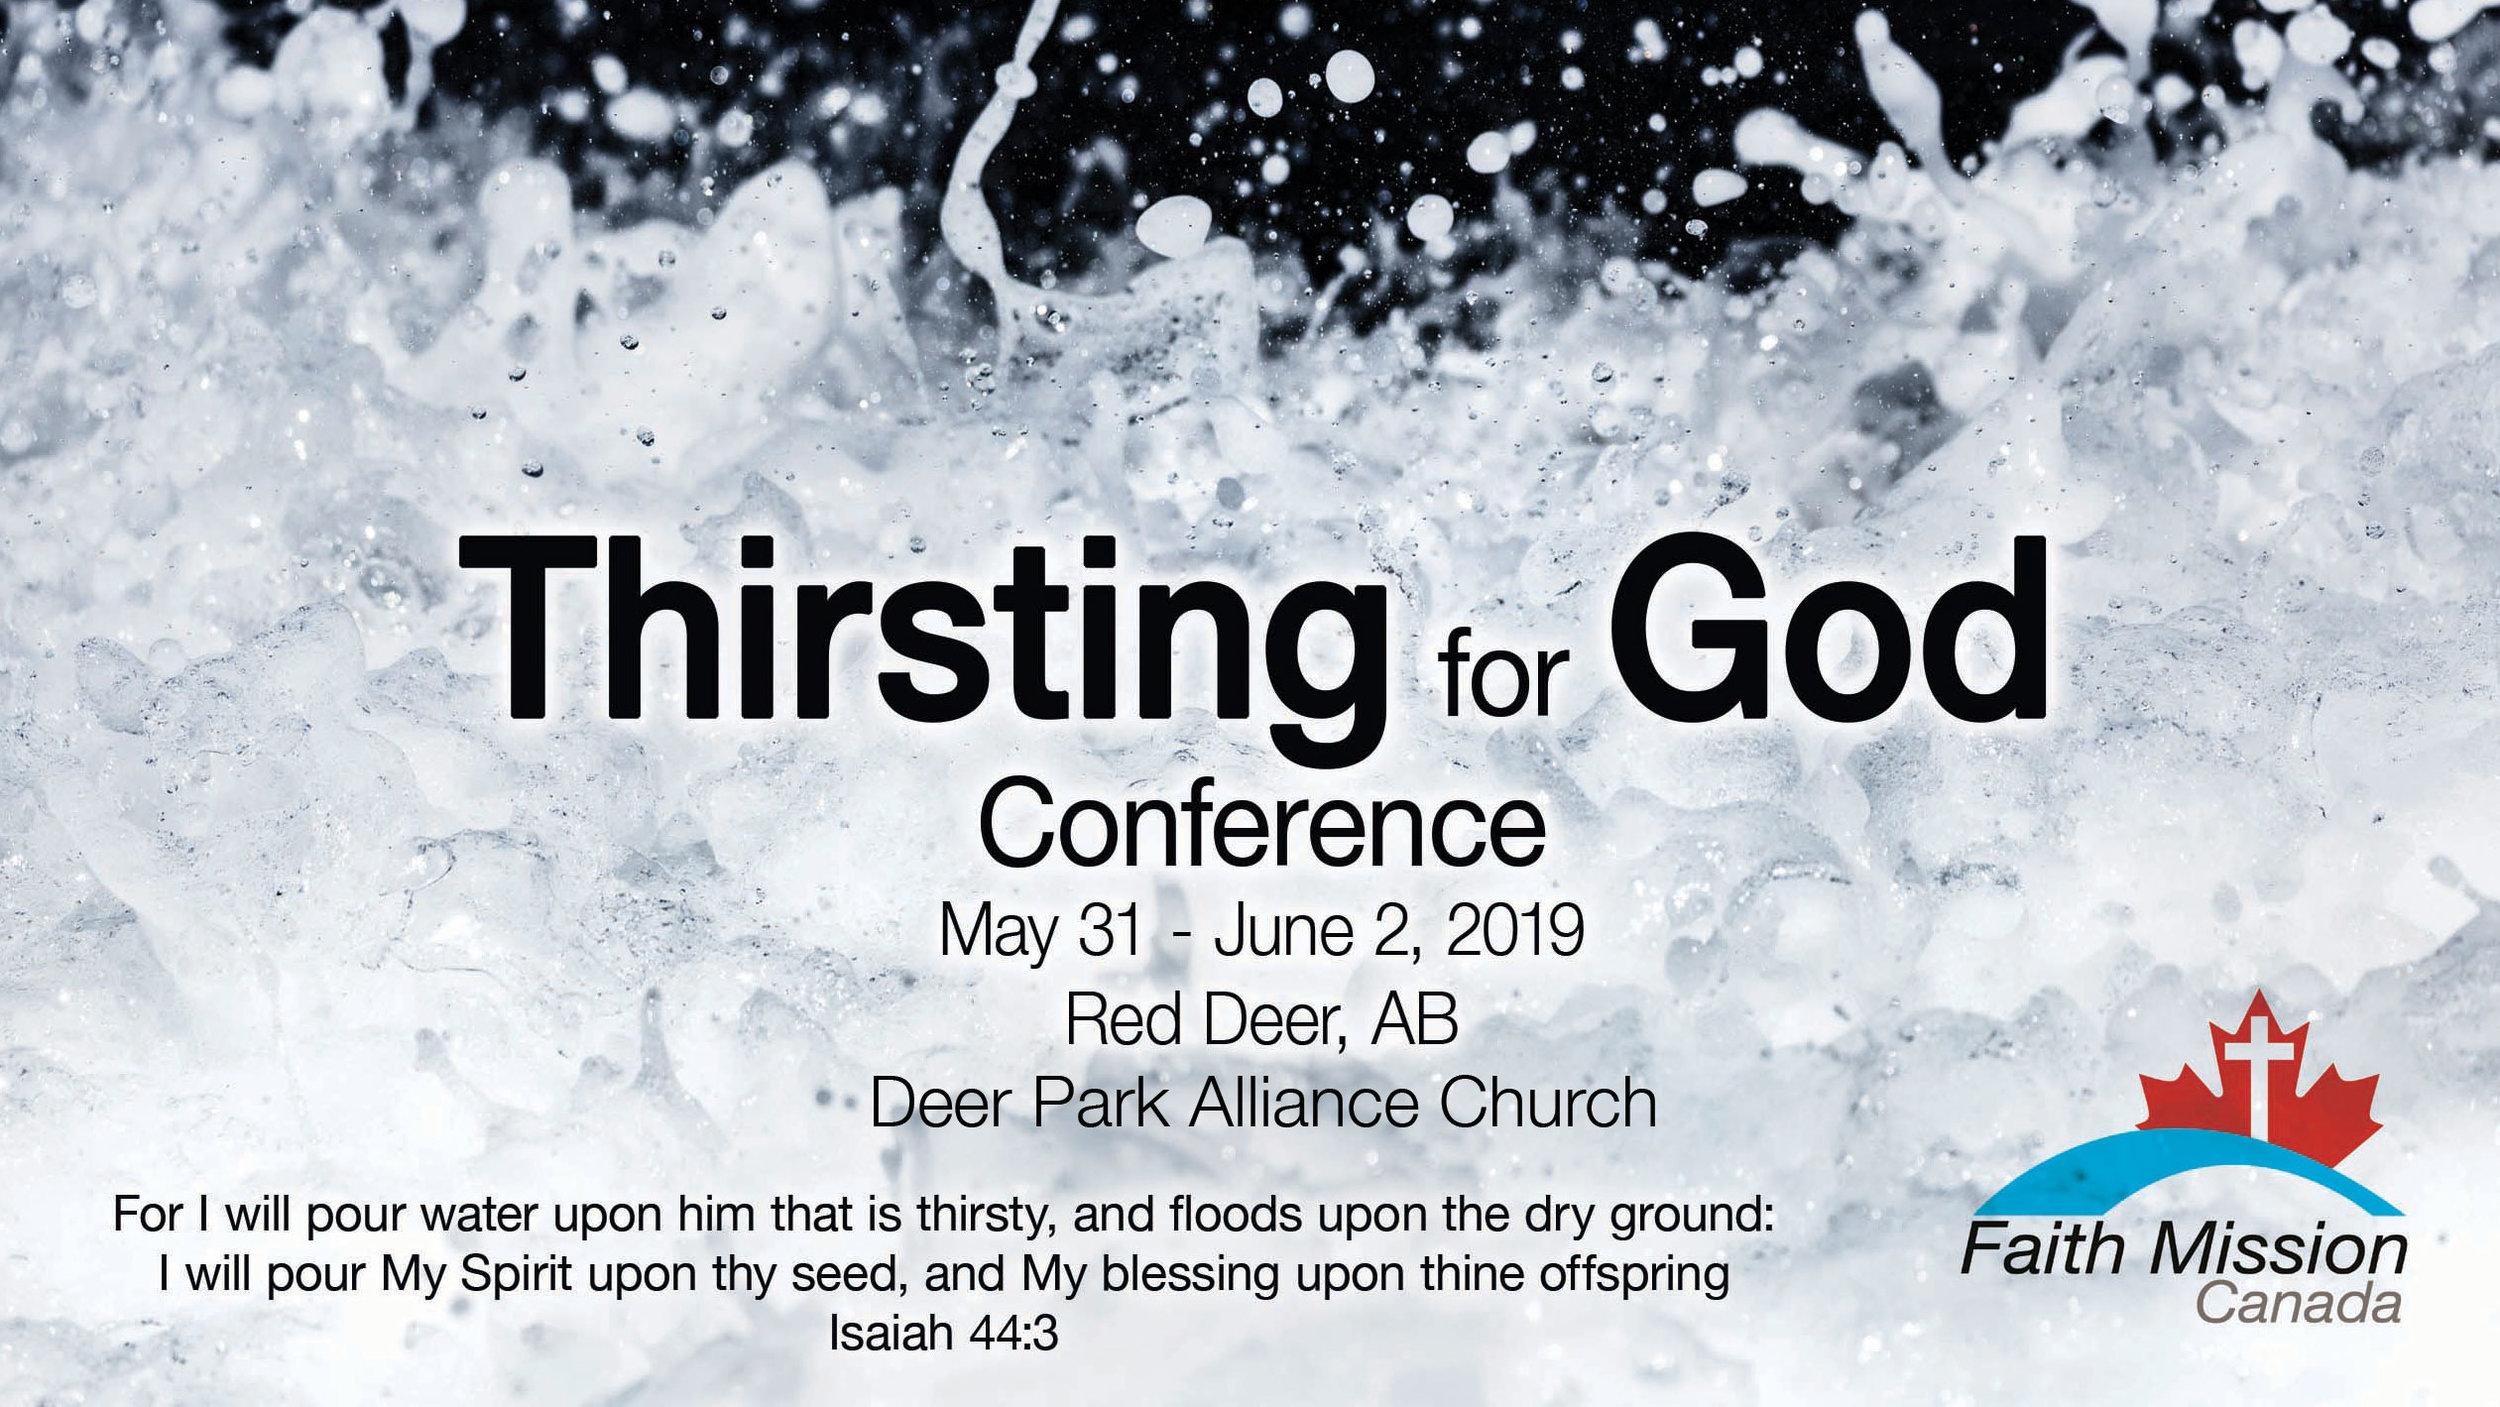 Thirsting for God-web 16x9 v2.jpg